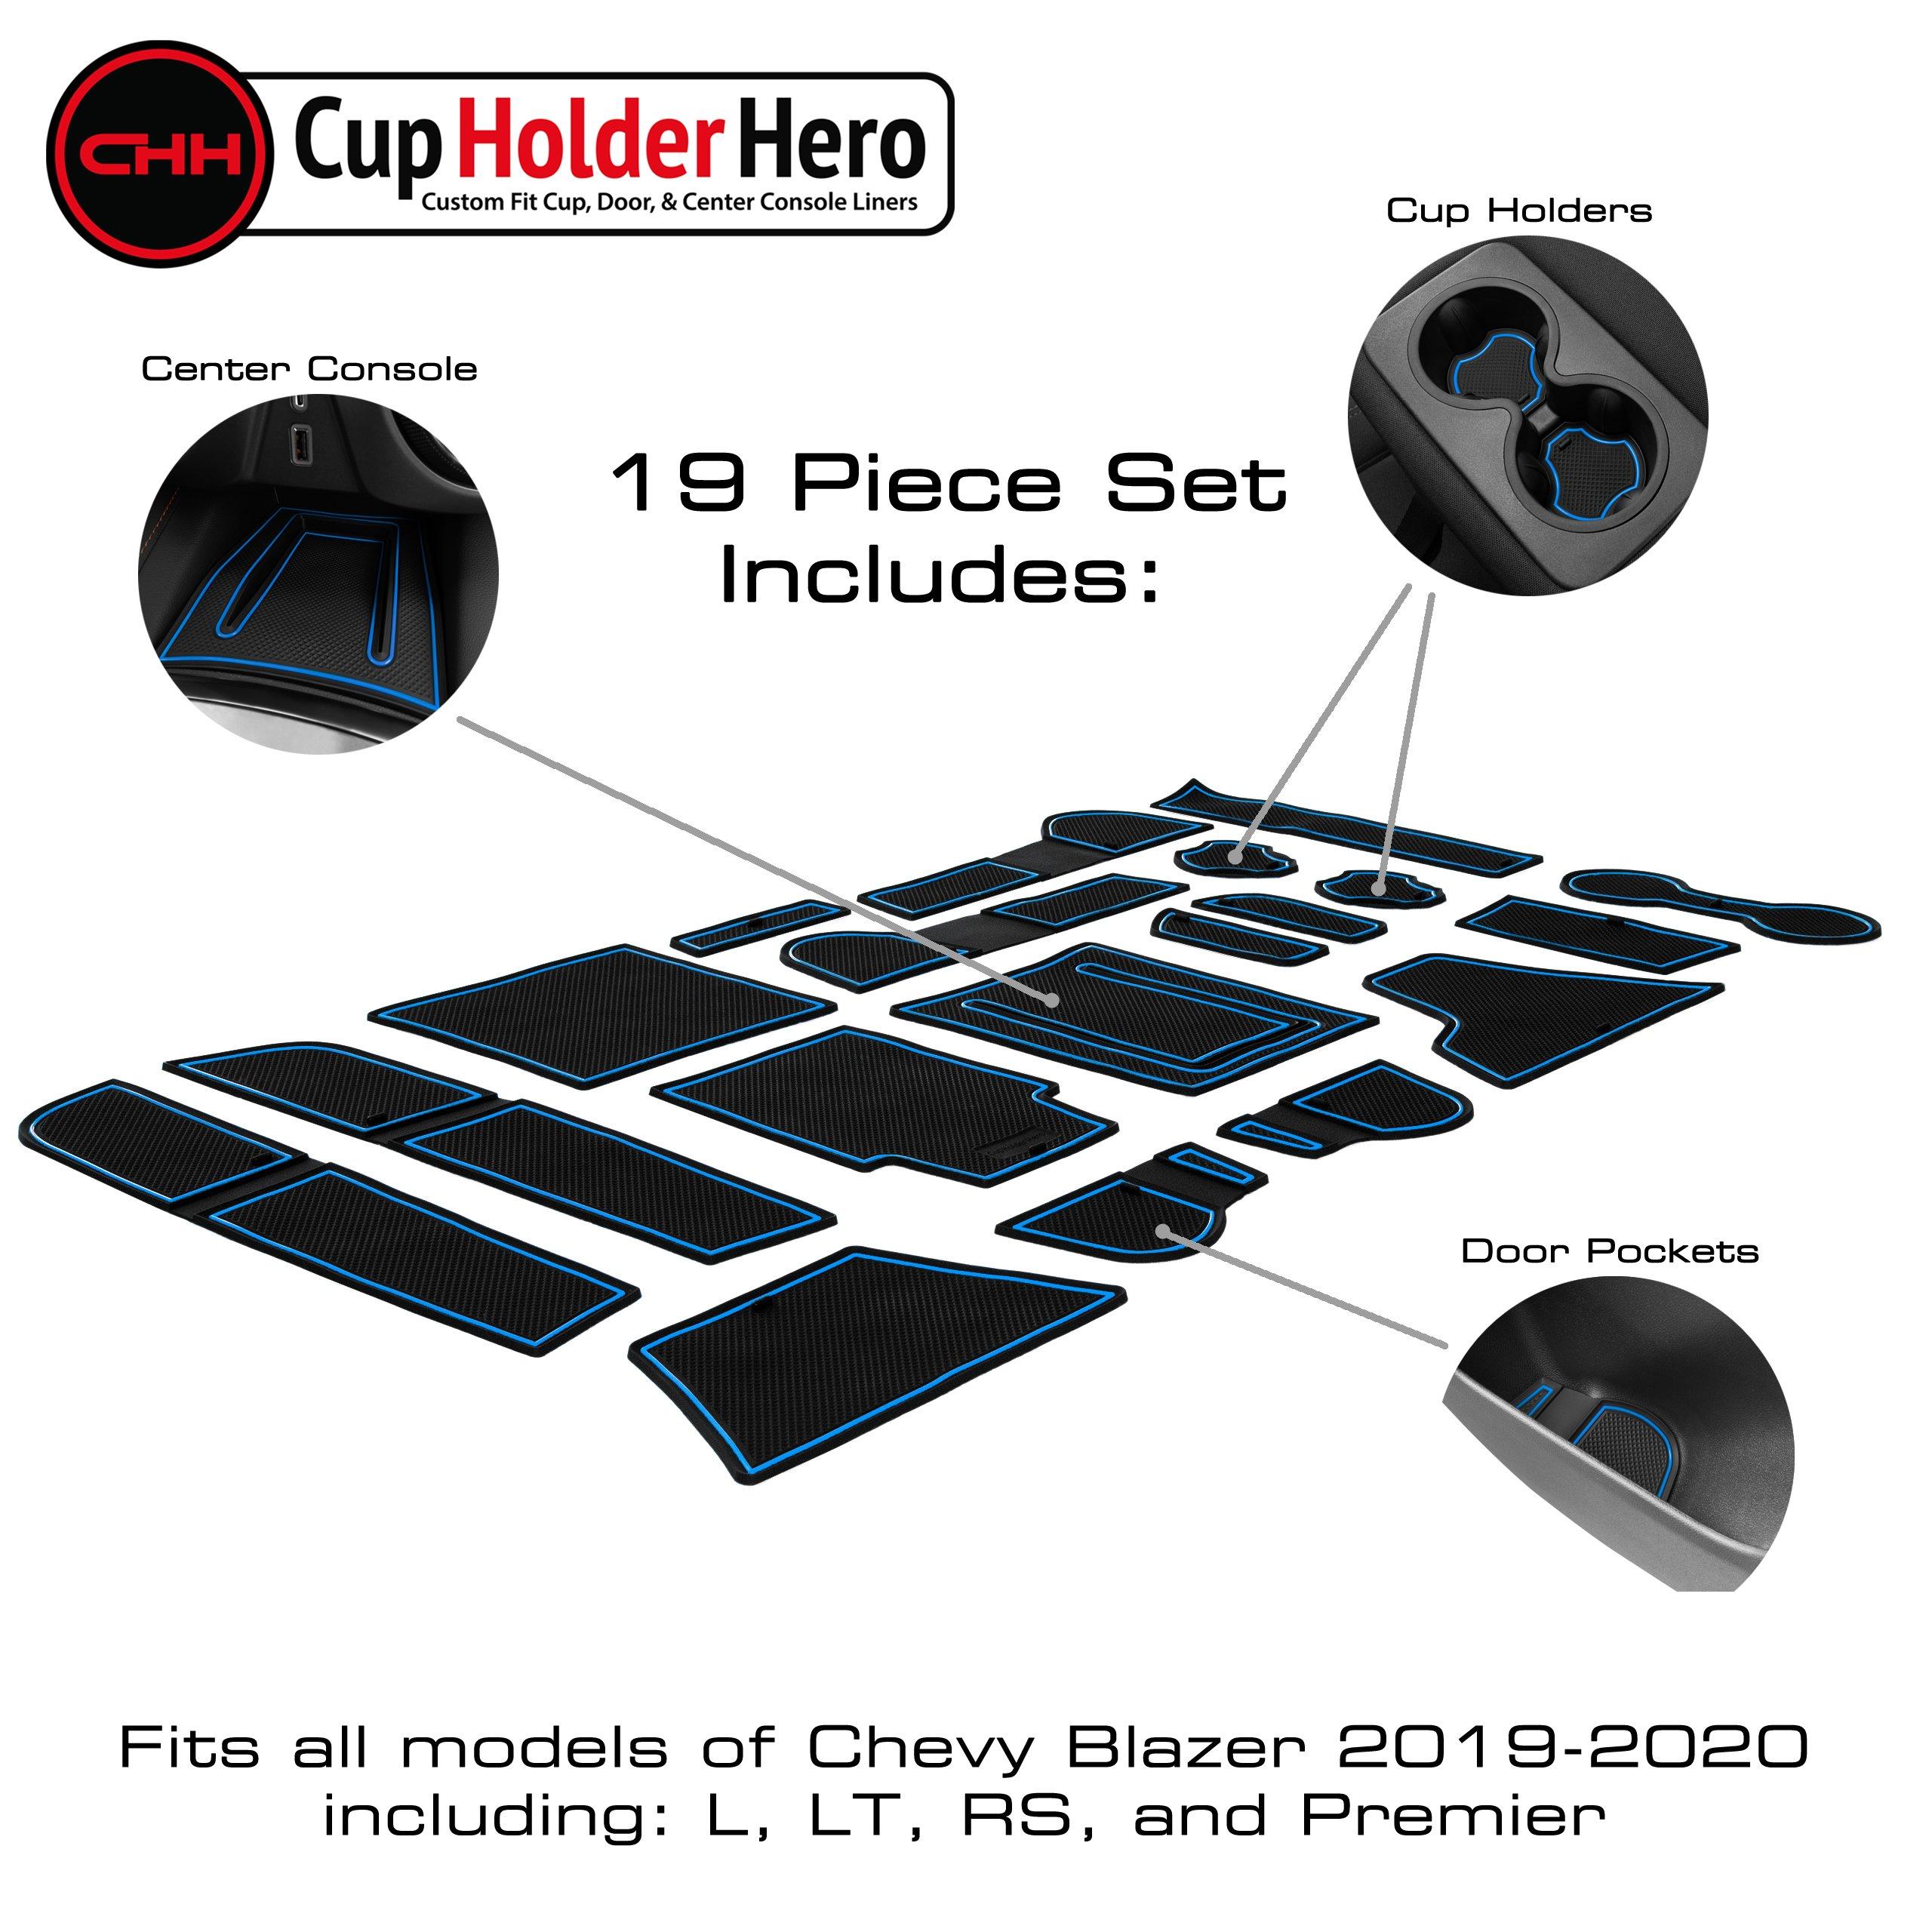 CupHolderHero-Chevy-Blazer-2019-2021-Liner-Accessories thumbnail 5